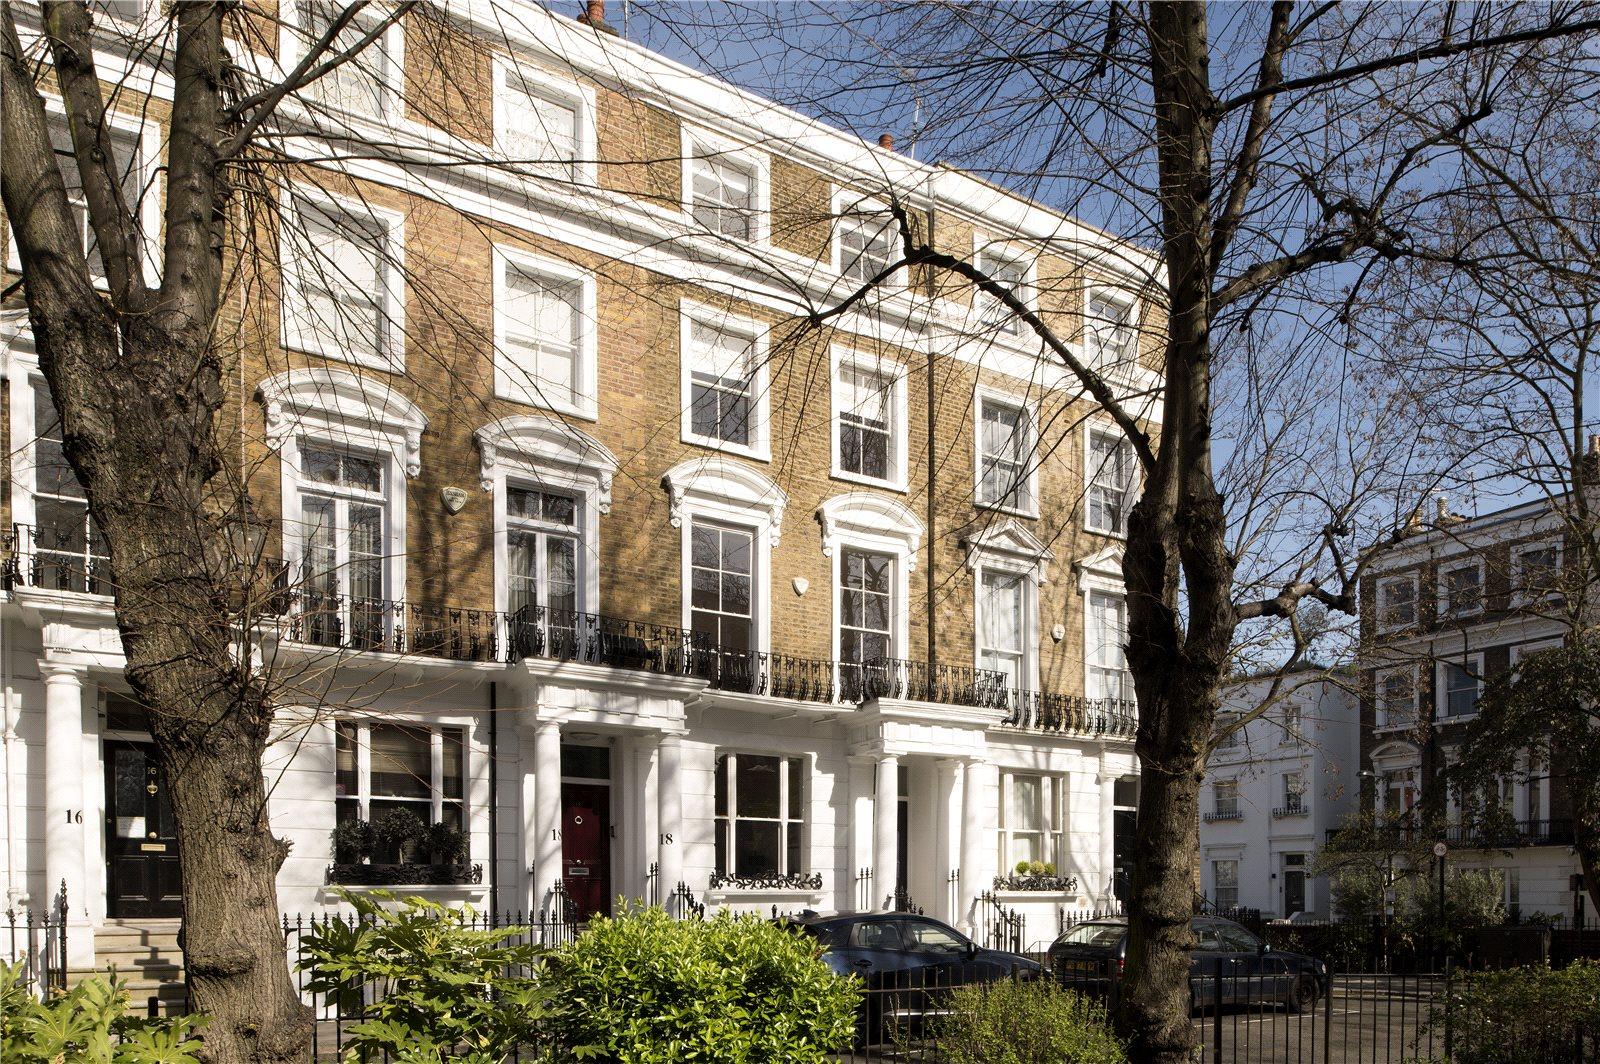 Moradia para Venda às Kildare Gardens, Notting Hill, London, W2 Notting Hill, London, Inglaterra